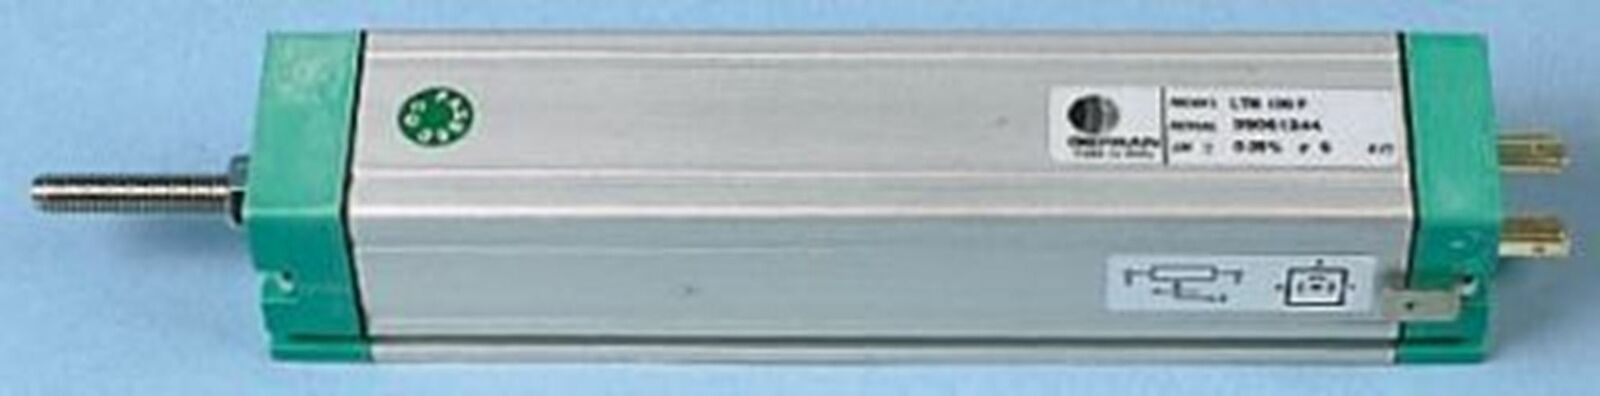 Gefran Geradelinig Umwandler 175mm Strich 60 V IP60